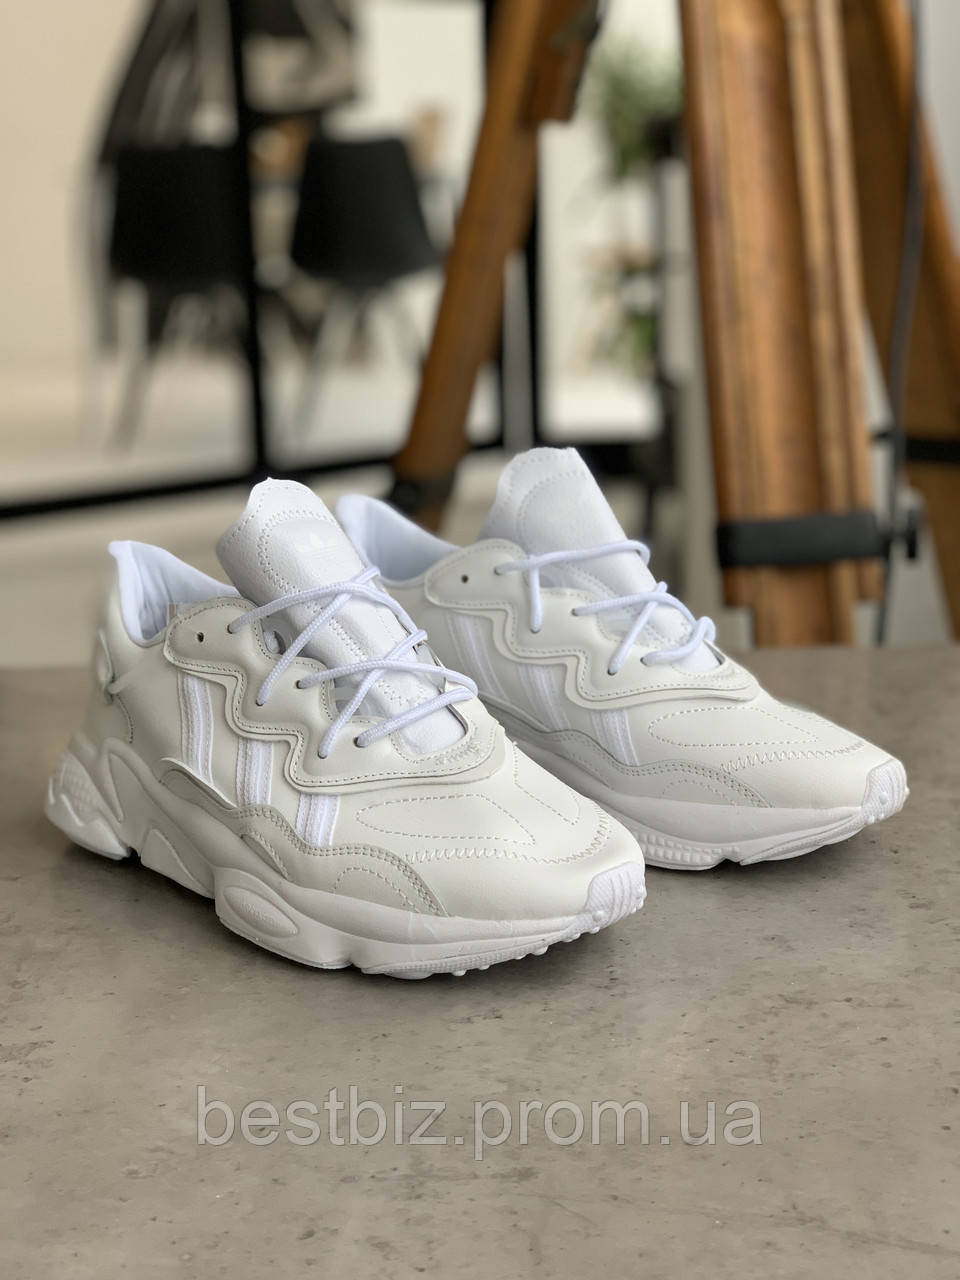 Кроссовки Adidas Ozweego White Адидас Озвиго Белые (42,43,45)